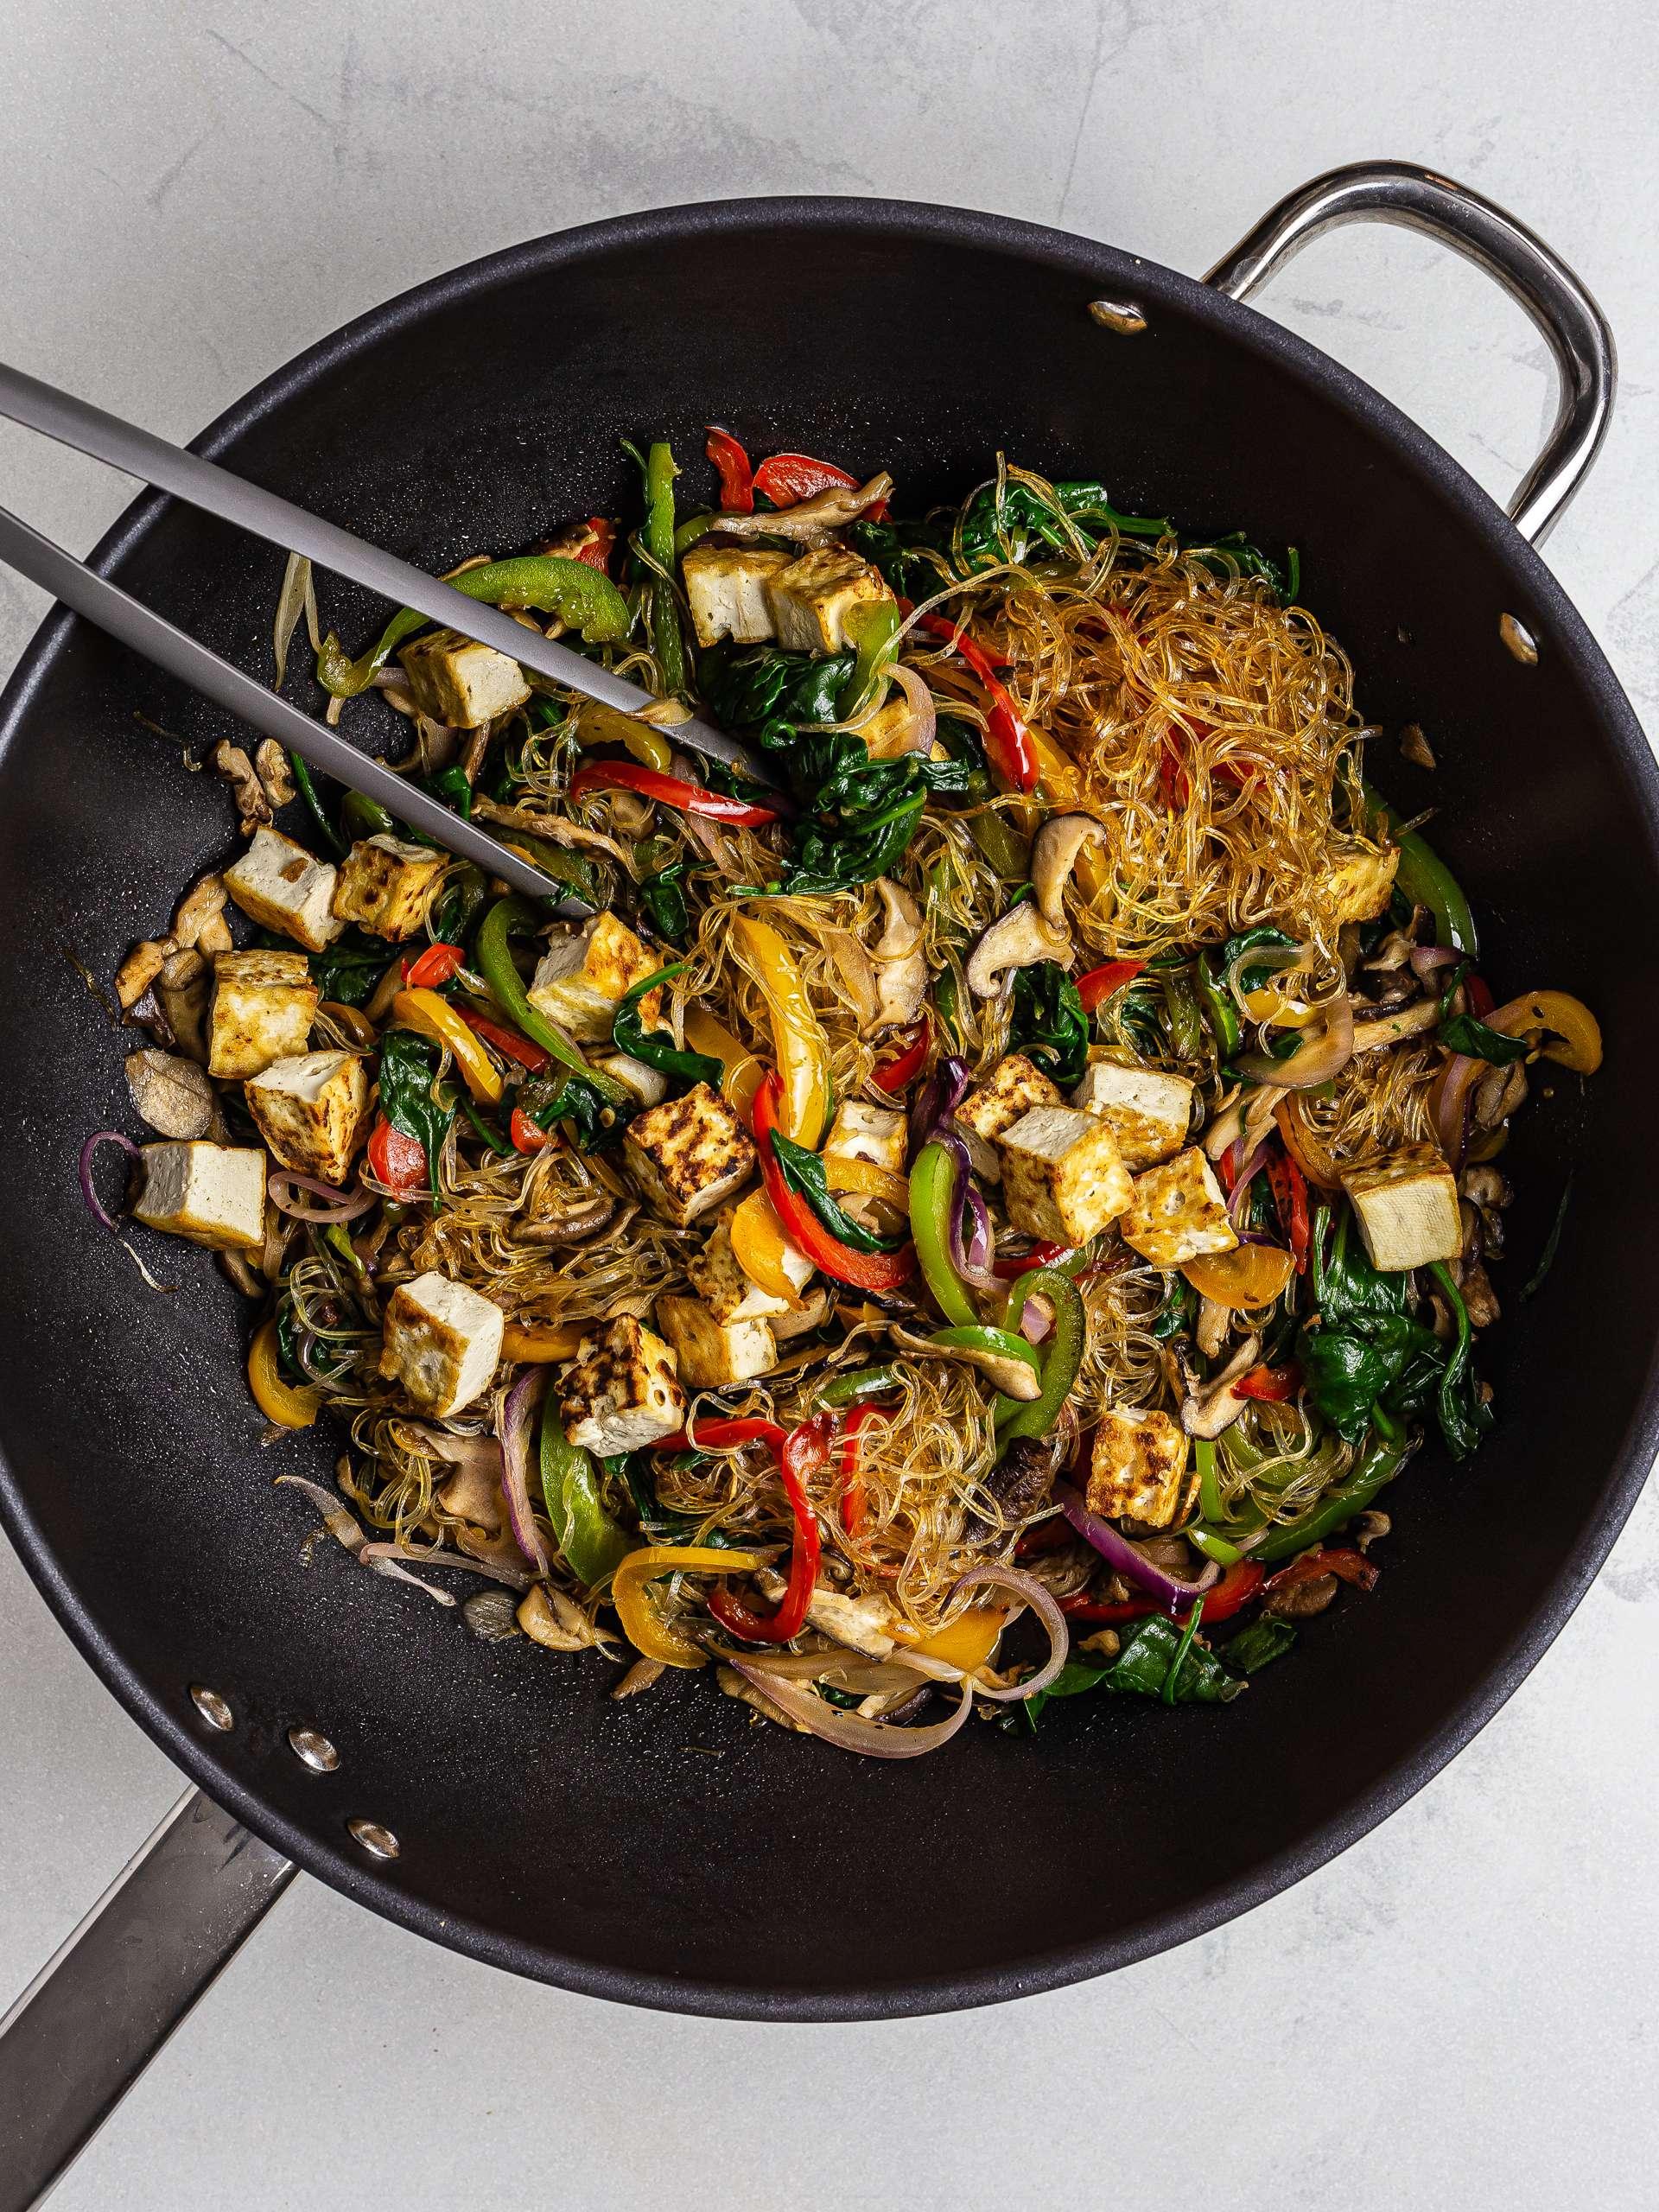 Glass noodles and vegetables stir-fry